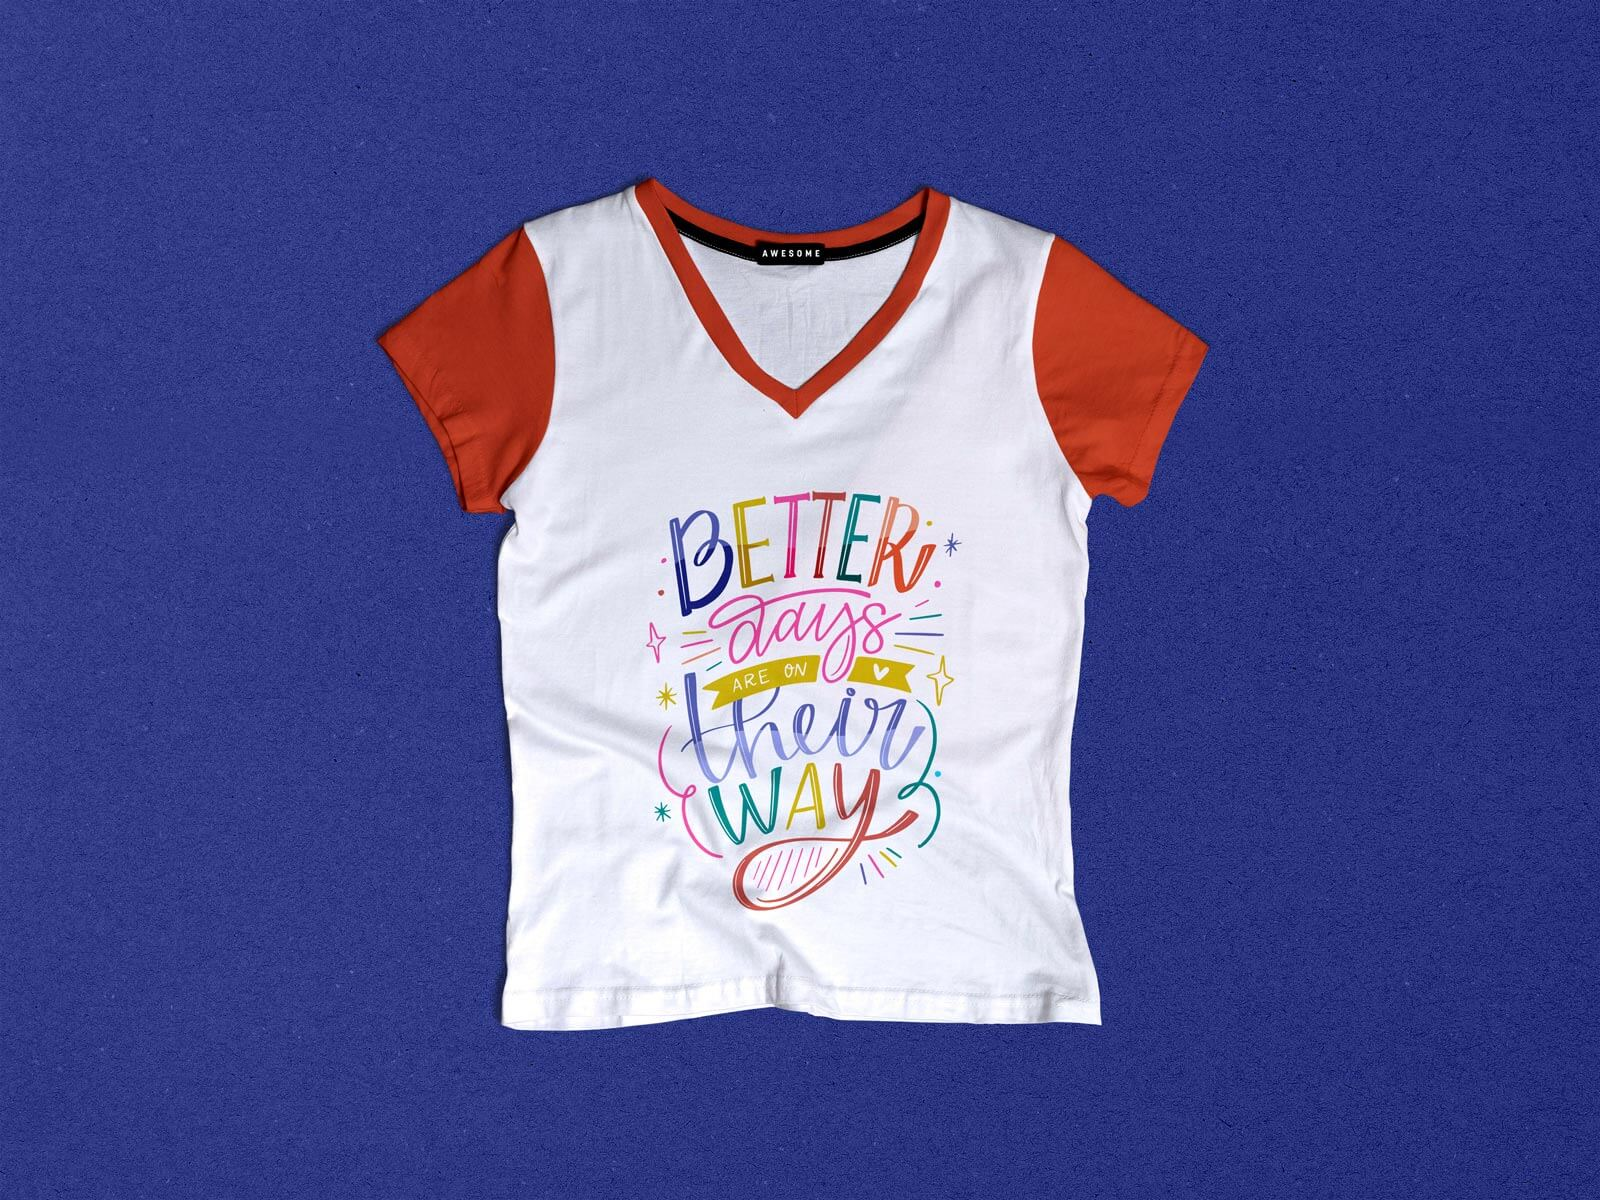 Free-V-Neck-T-Shirt-Mockup-PSD-4